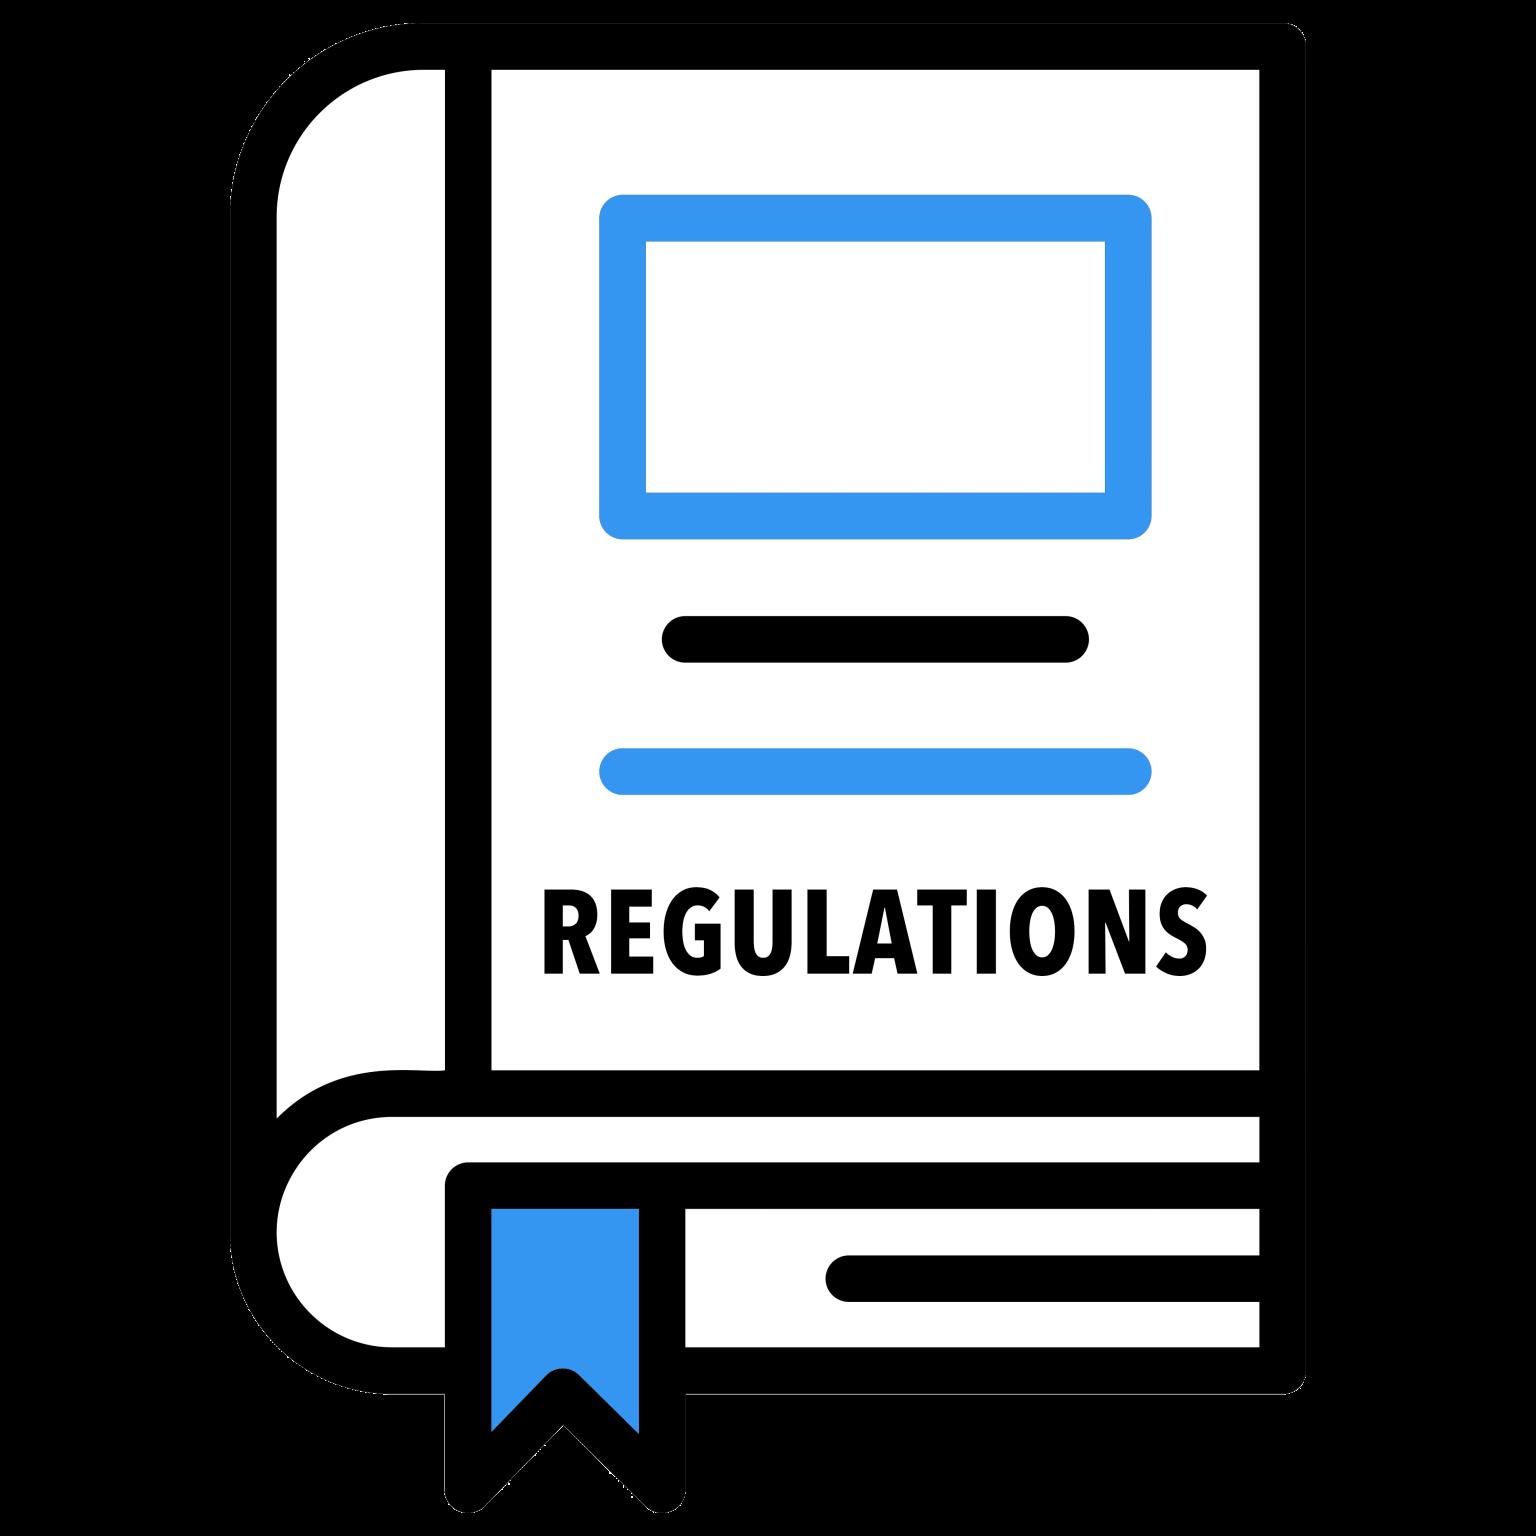 regulators_icon-1-1536x1536https